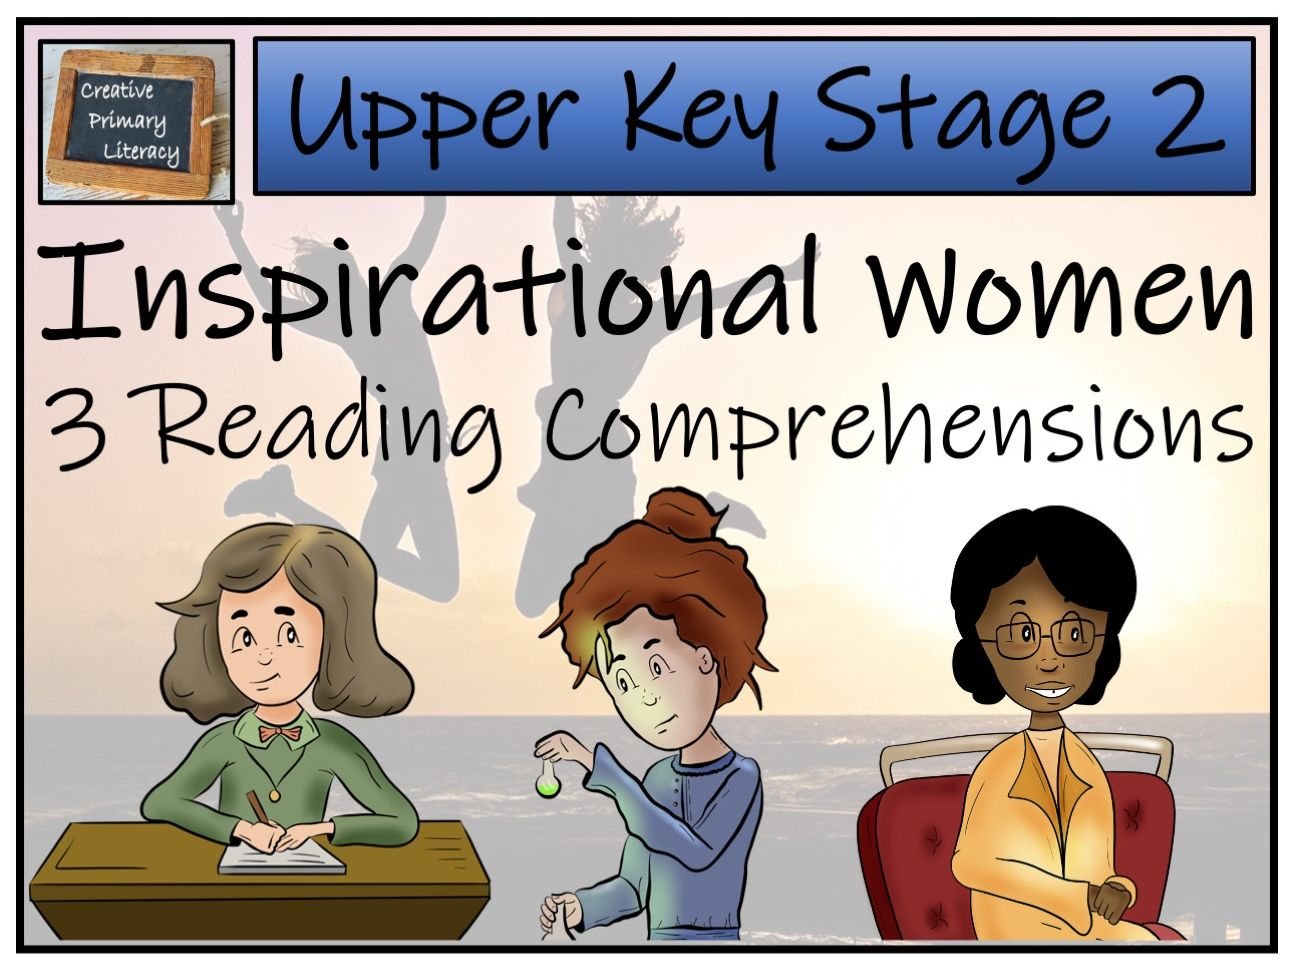 UKS2 Inspirational Women Reading Comprehension Bundle